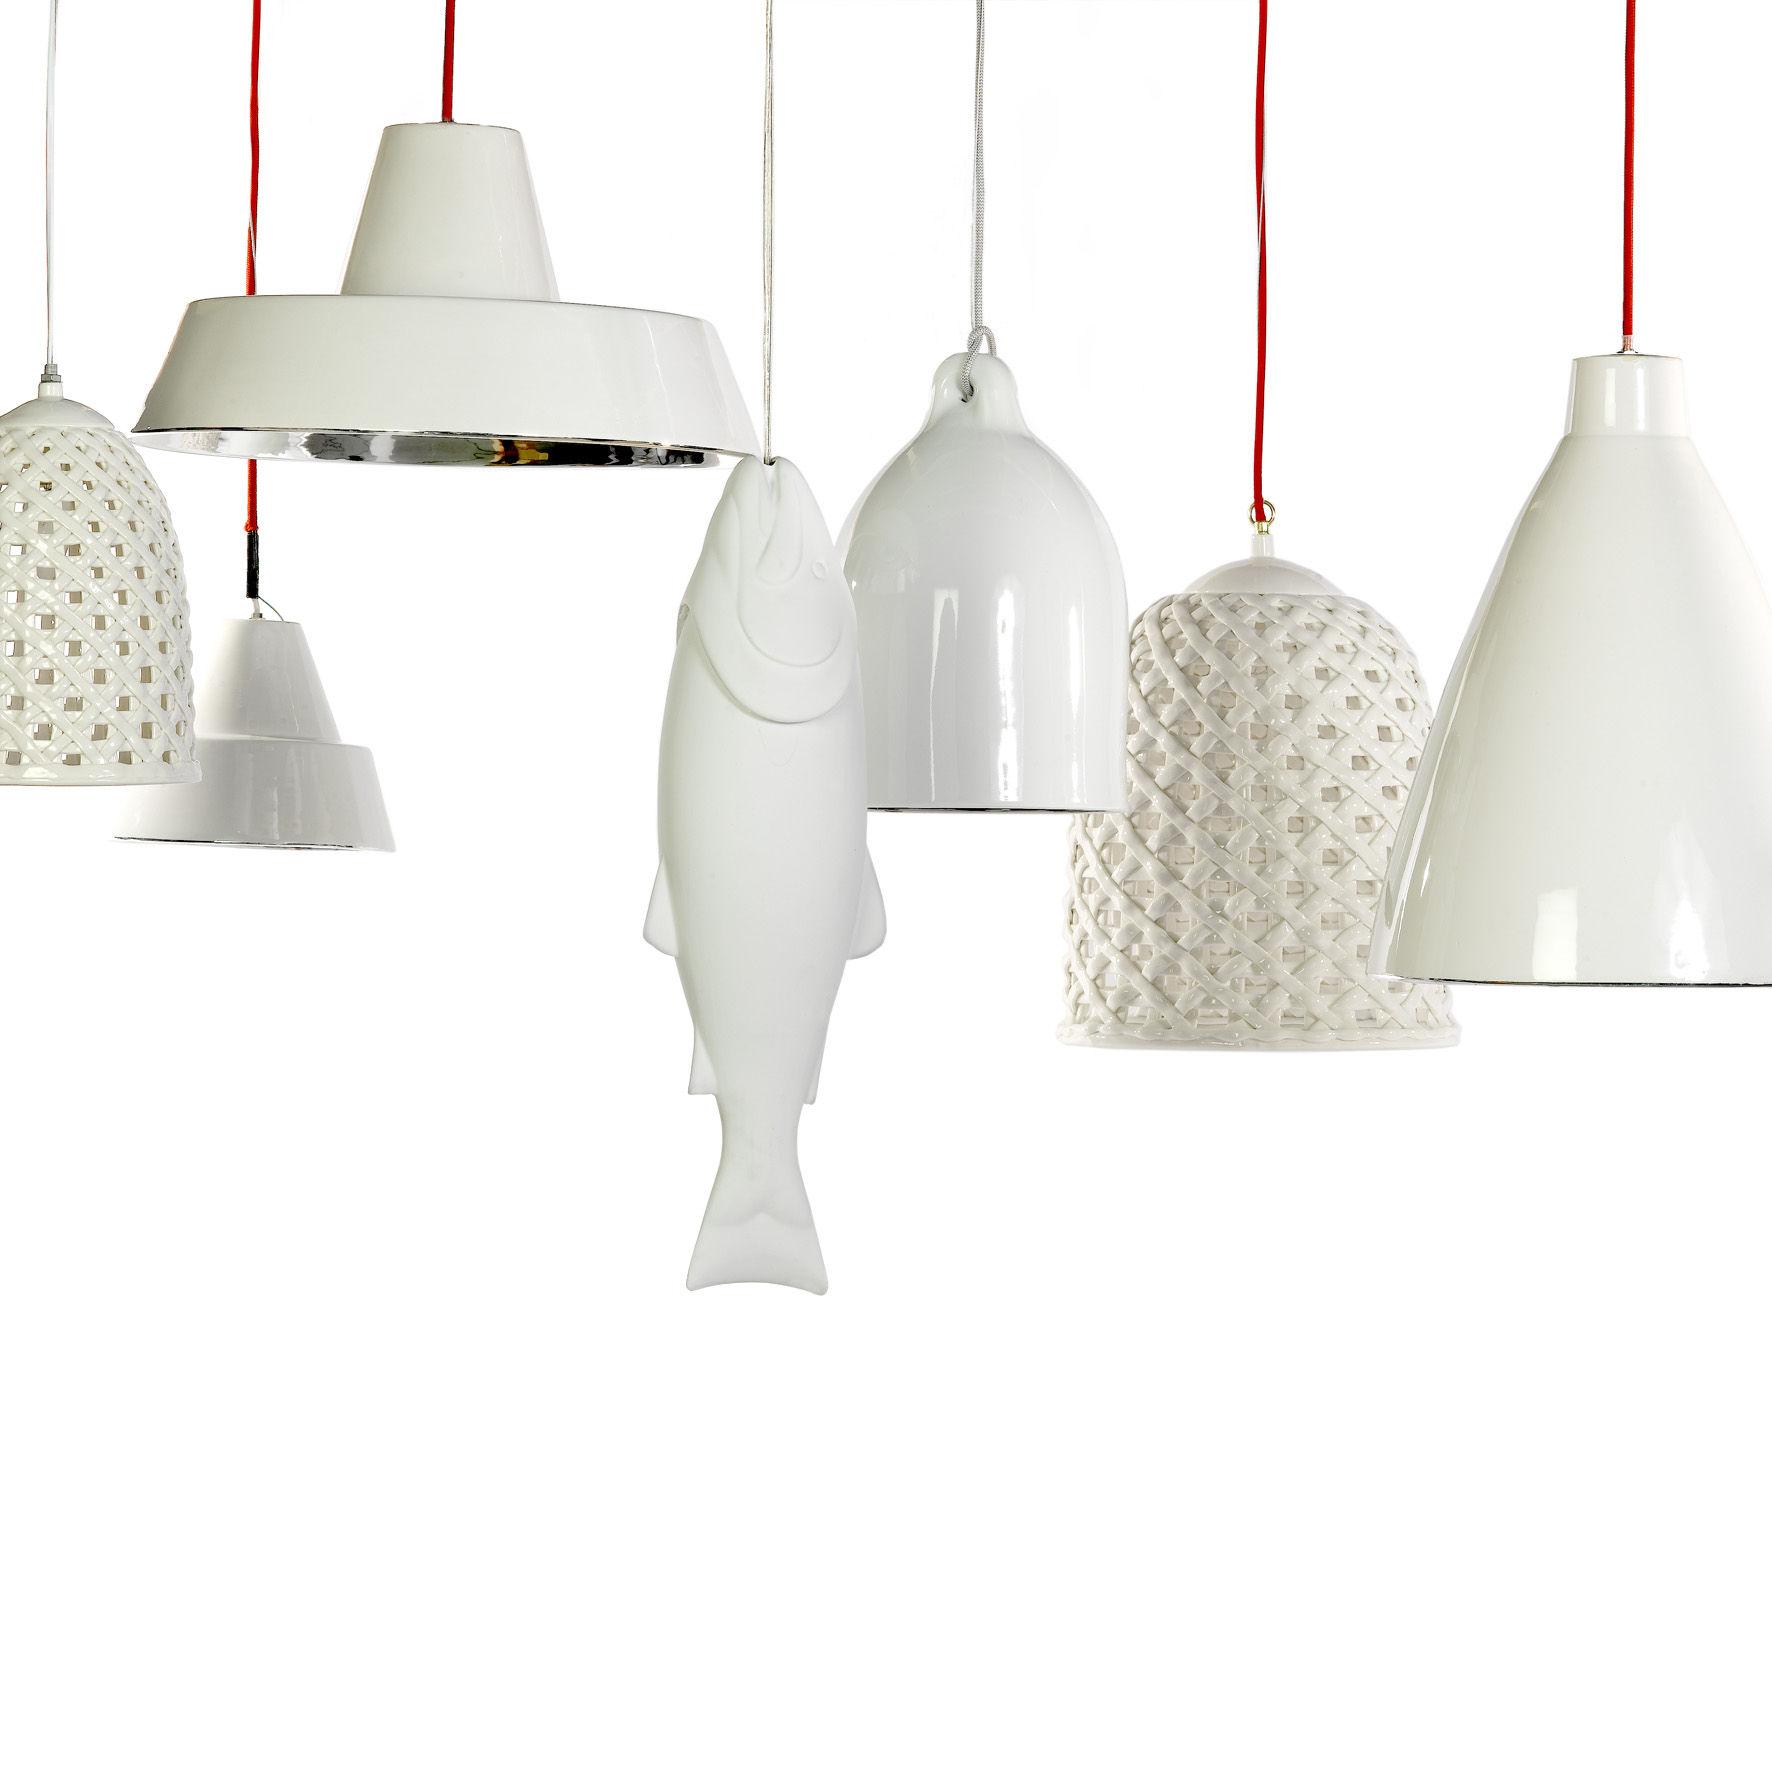 woven s pendant 21 cm white by pols potten. Black Bedroom Furniture Sets. Home Design Ideas